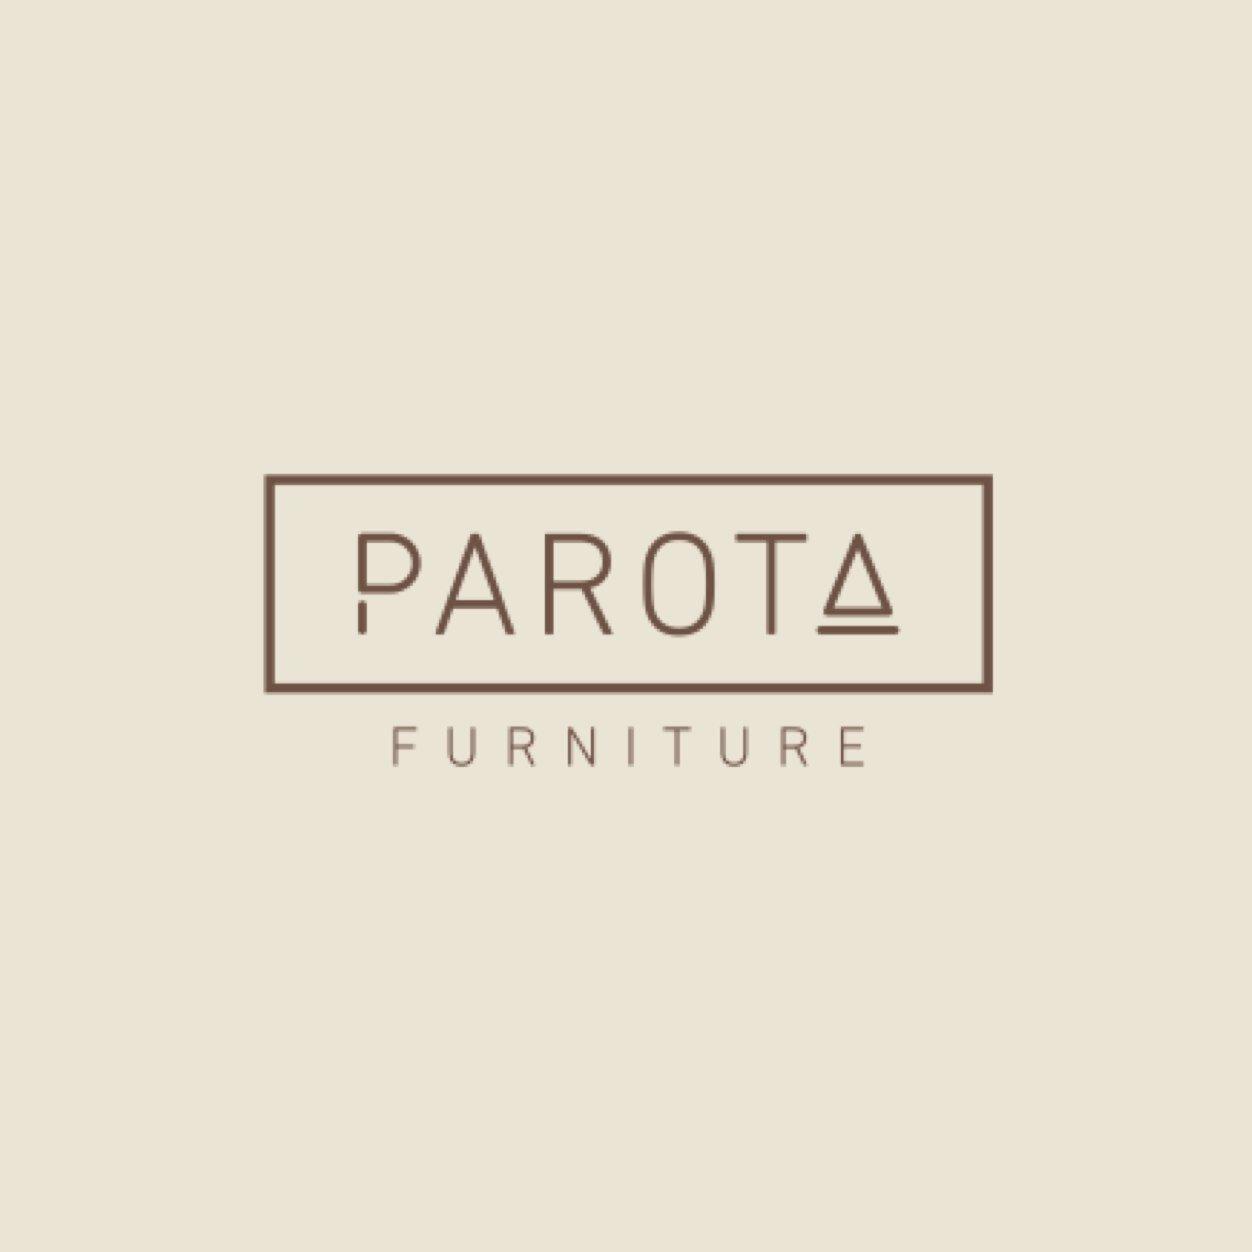 muebles artesanales (@parotafurniture)  Twitter